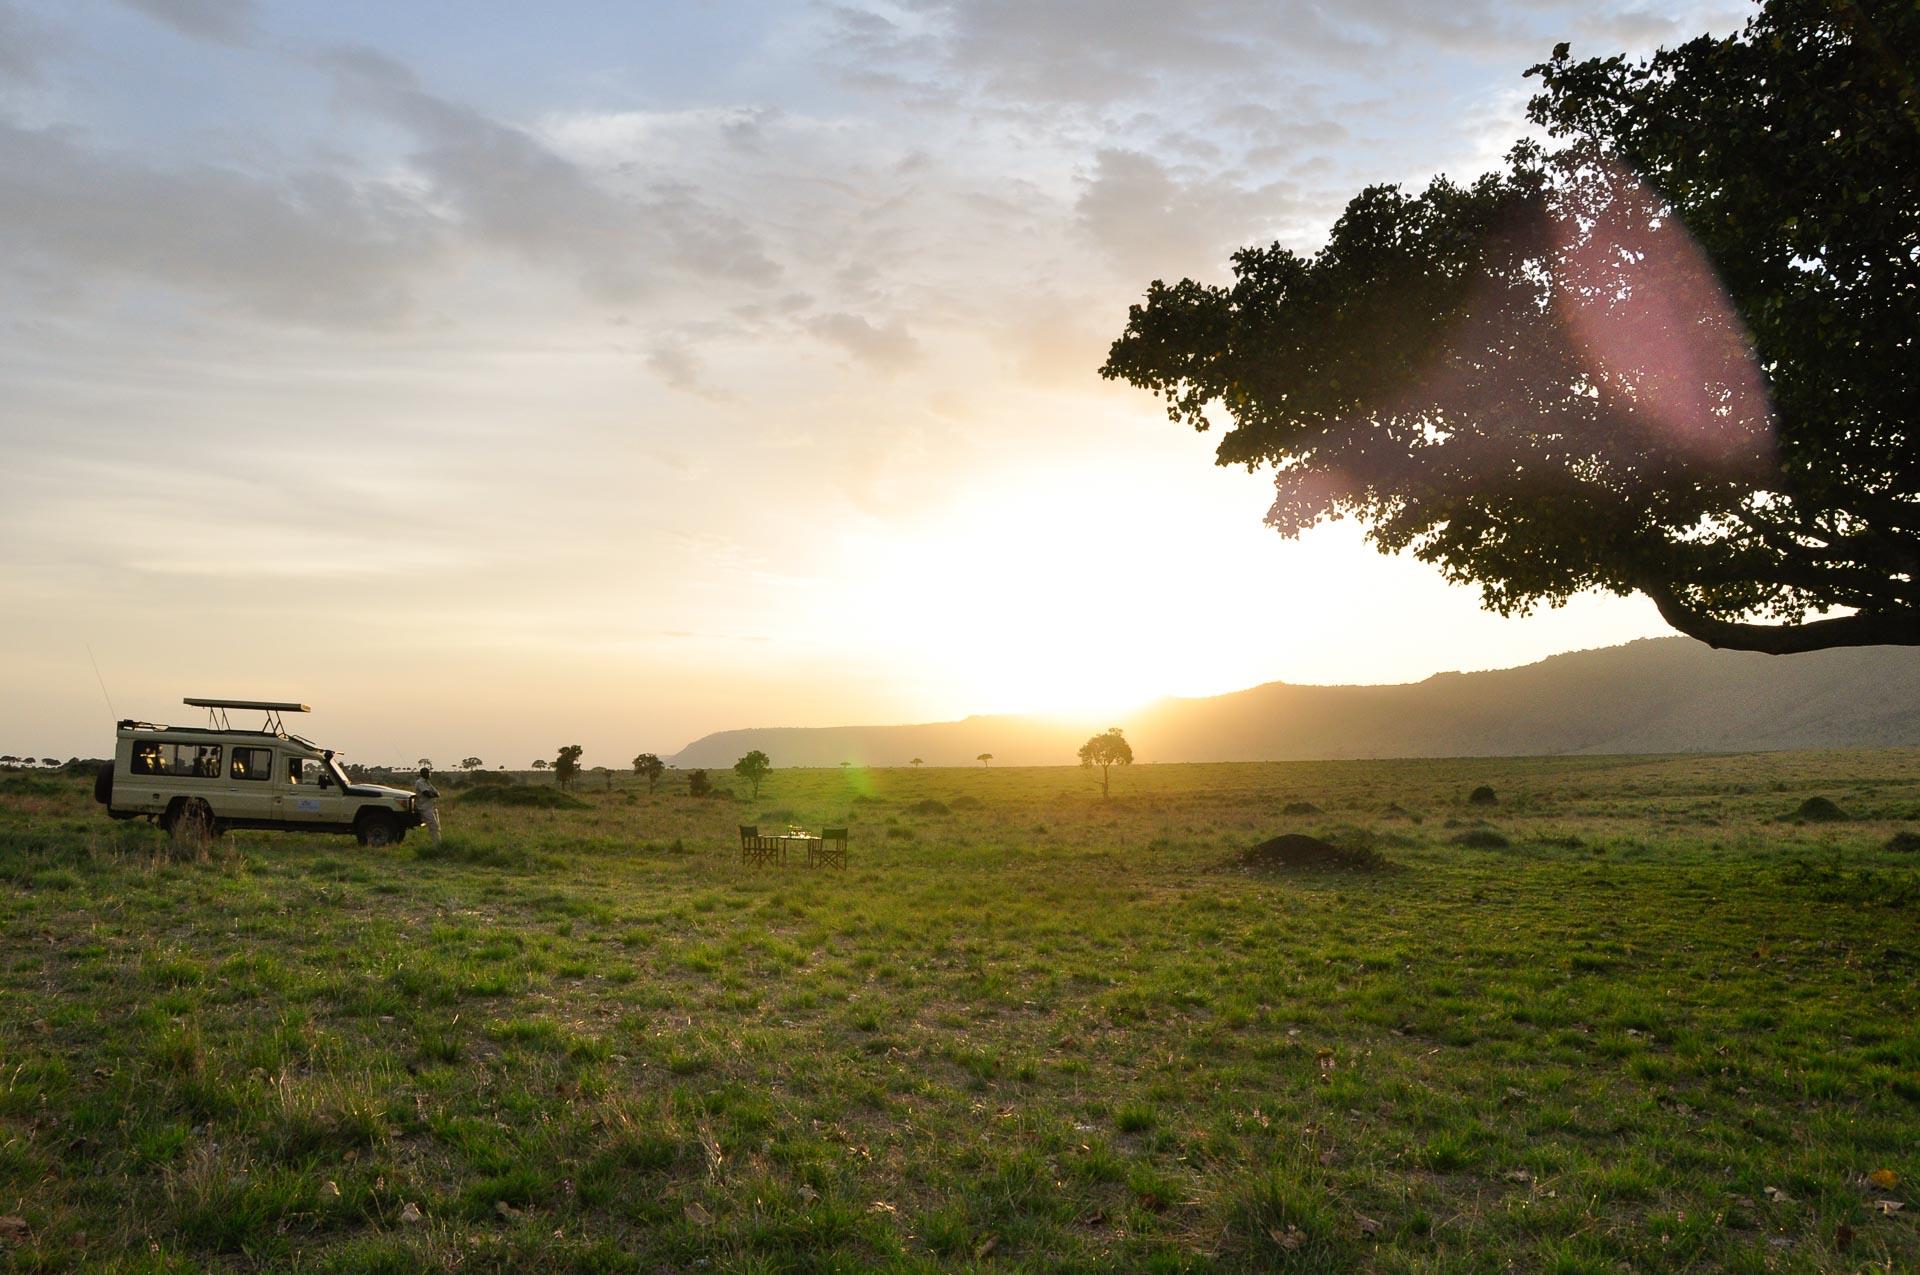 Masai-Mara-Sundowner-Kenia-Globetrotter-Select-4